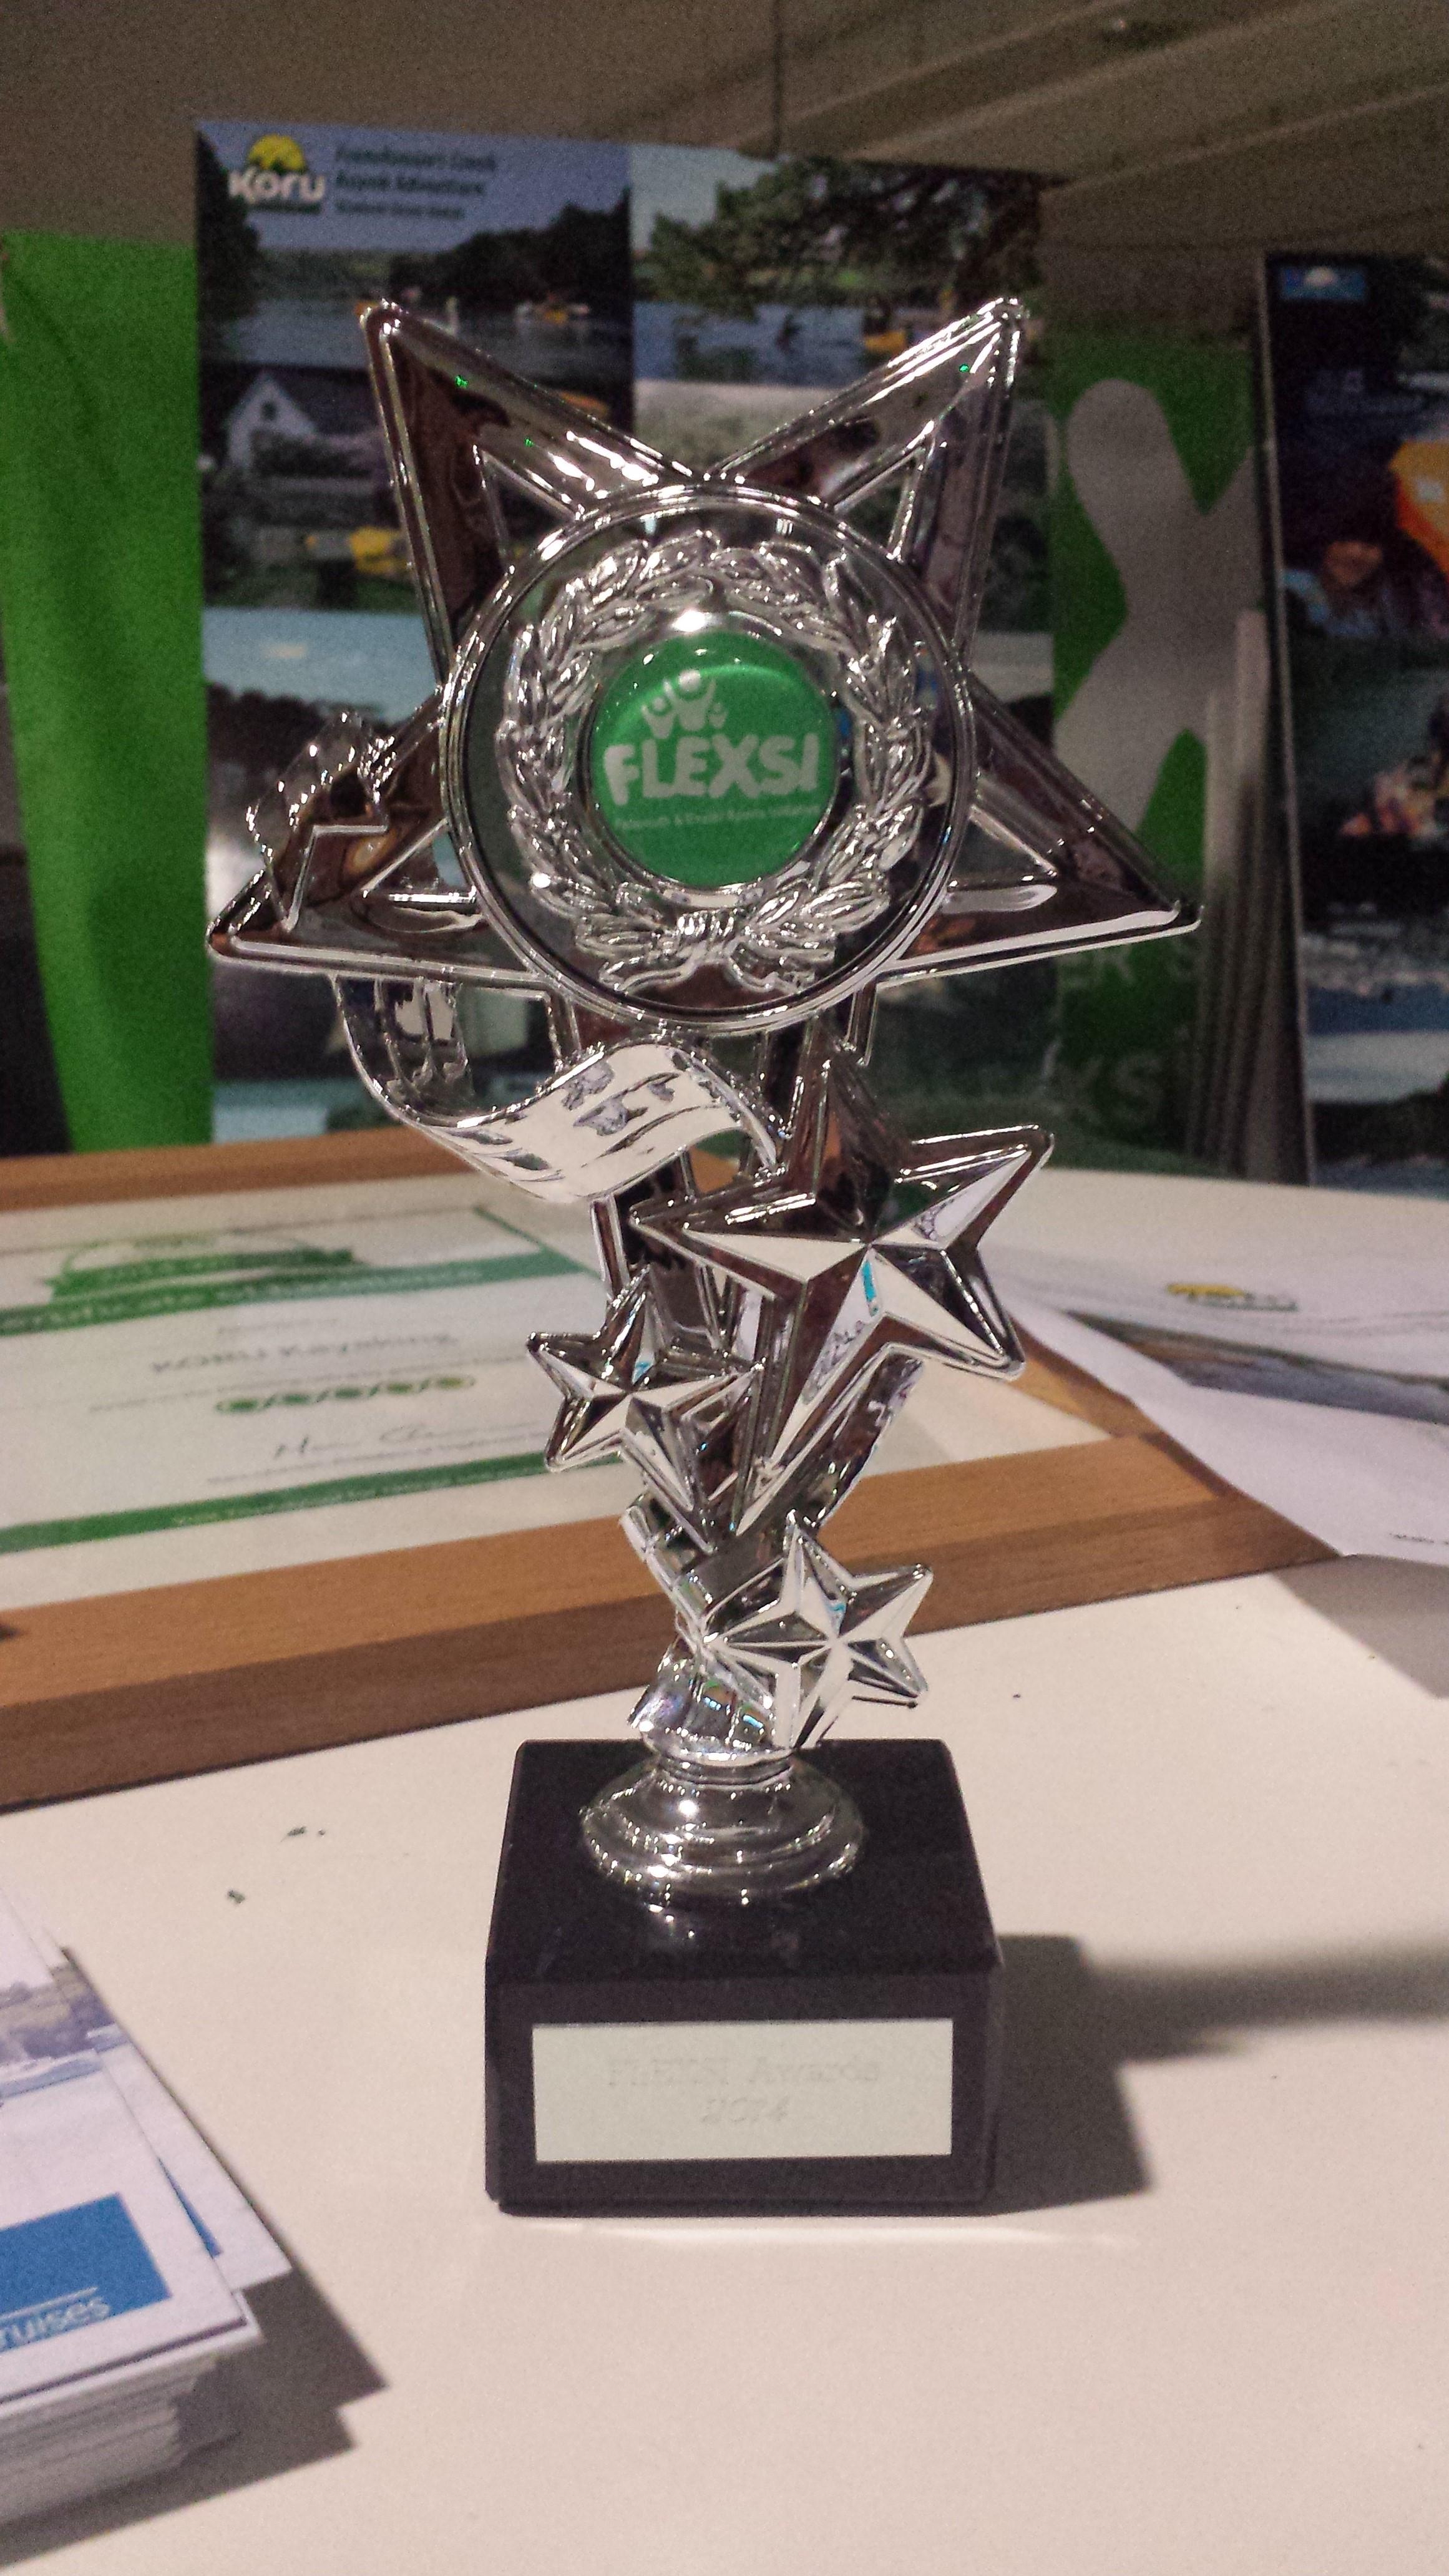 Flexsi Award, Koru Kayaking, University of Exeter